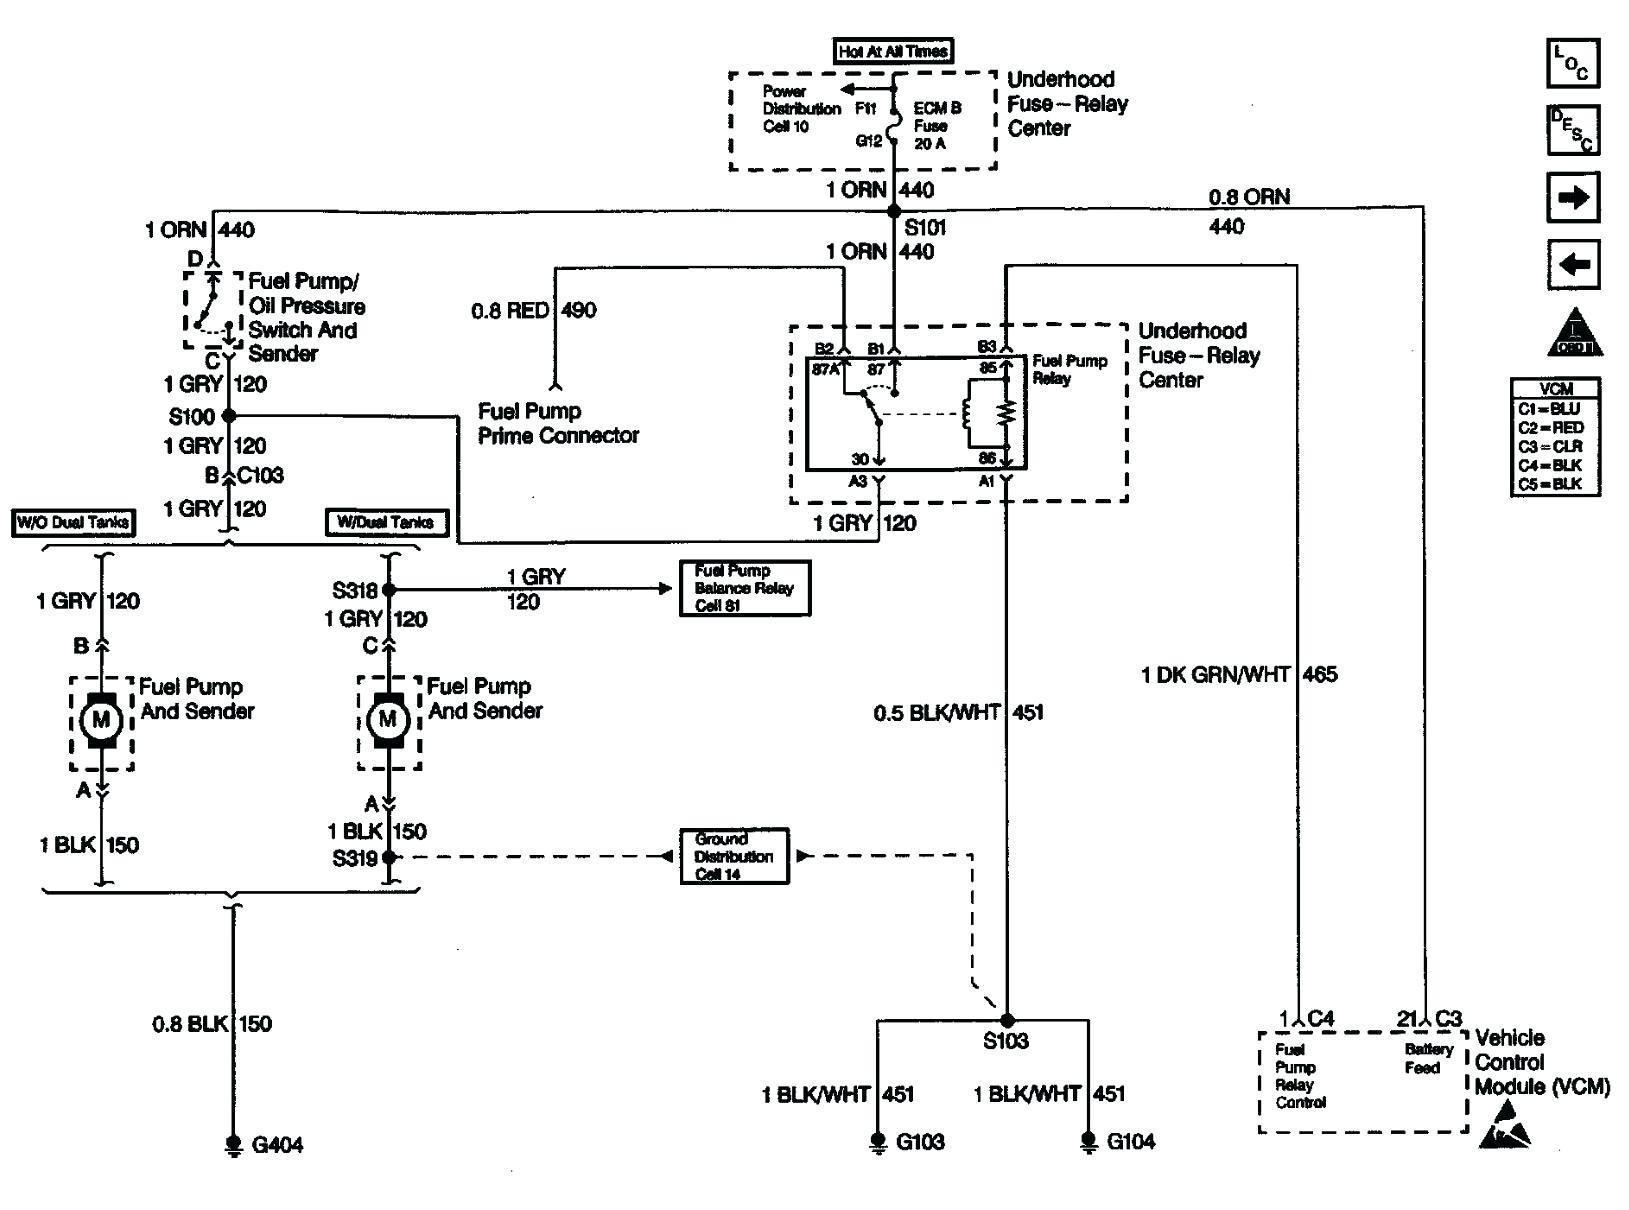 hight resolution of 2005 dodge ram 1500 fuel pump wiring diagram gmc jimmy fuel pump wiring diagram also